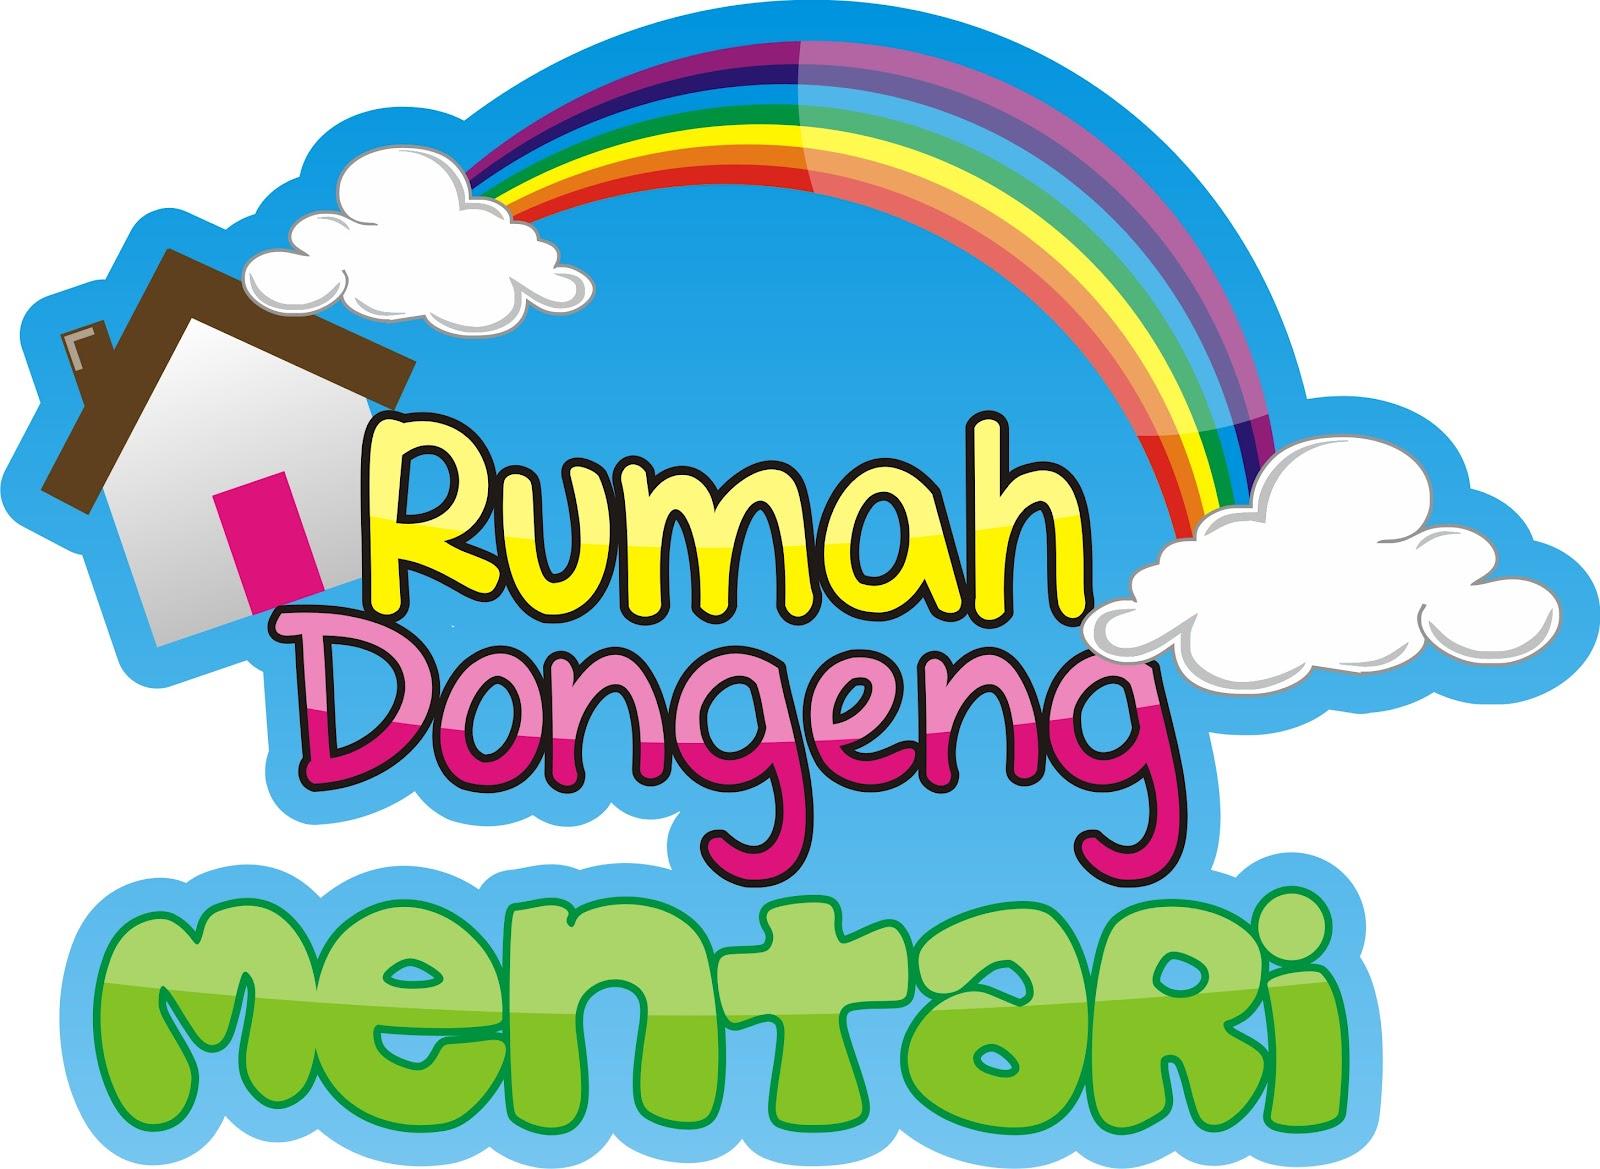 cerita cerita bahasa inggris asli indonesia cerita legenda tersebut